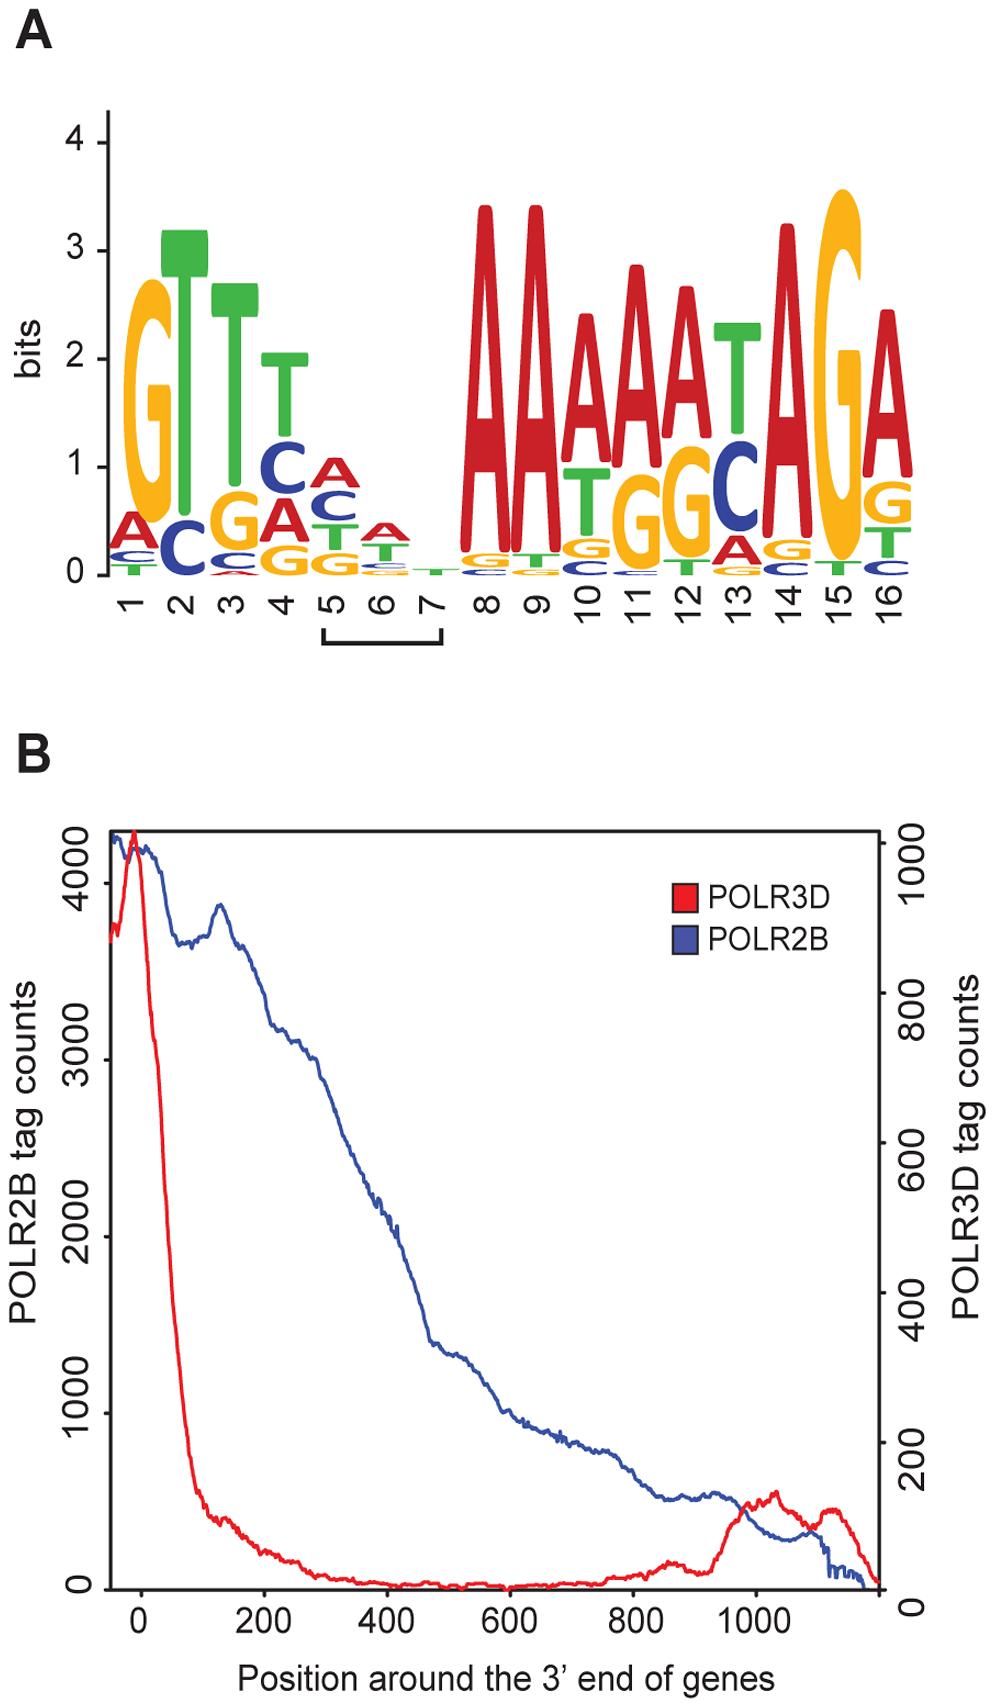 RNA pol II and III occupancy within 3′ flanking regions.